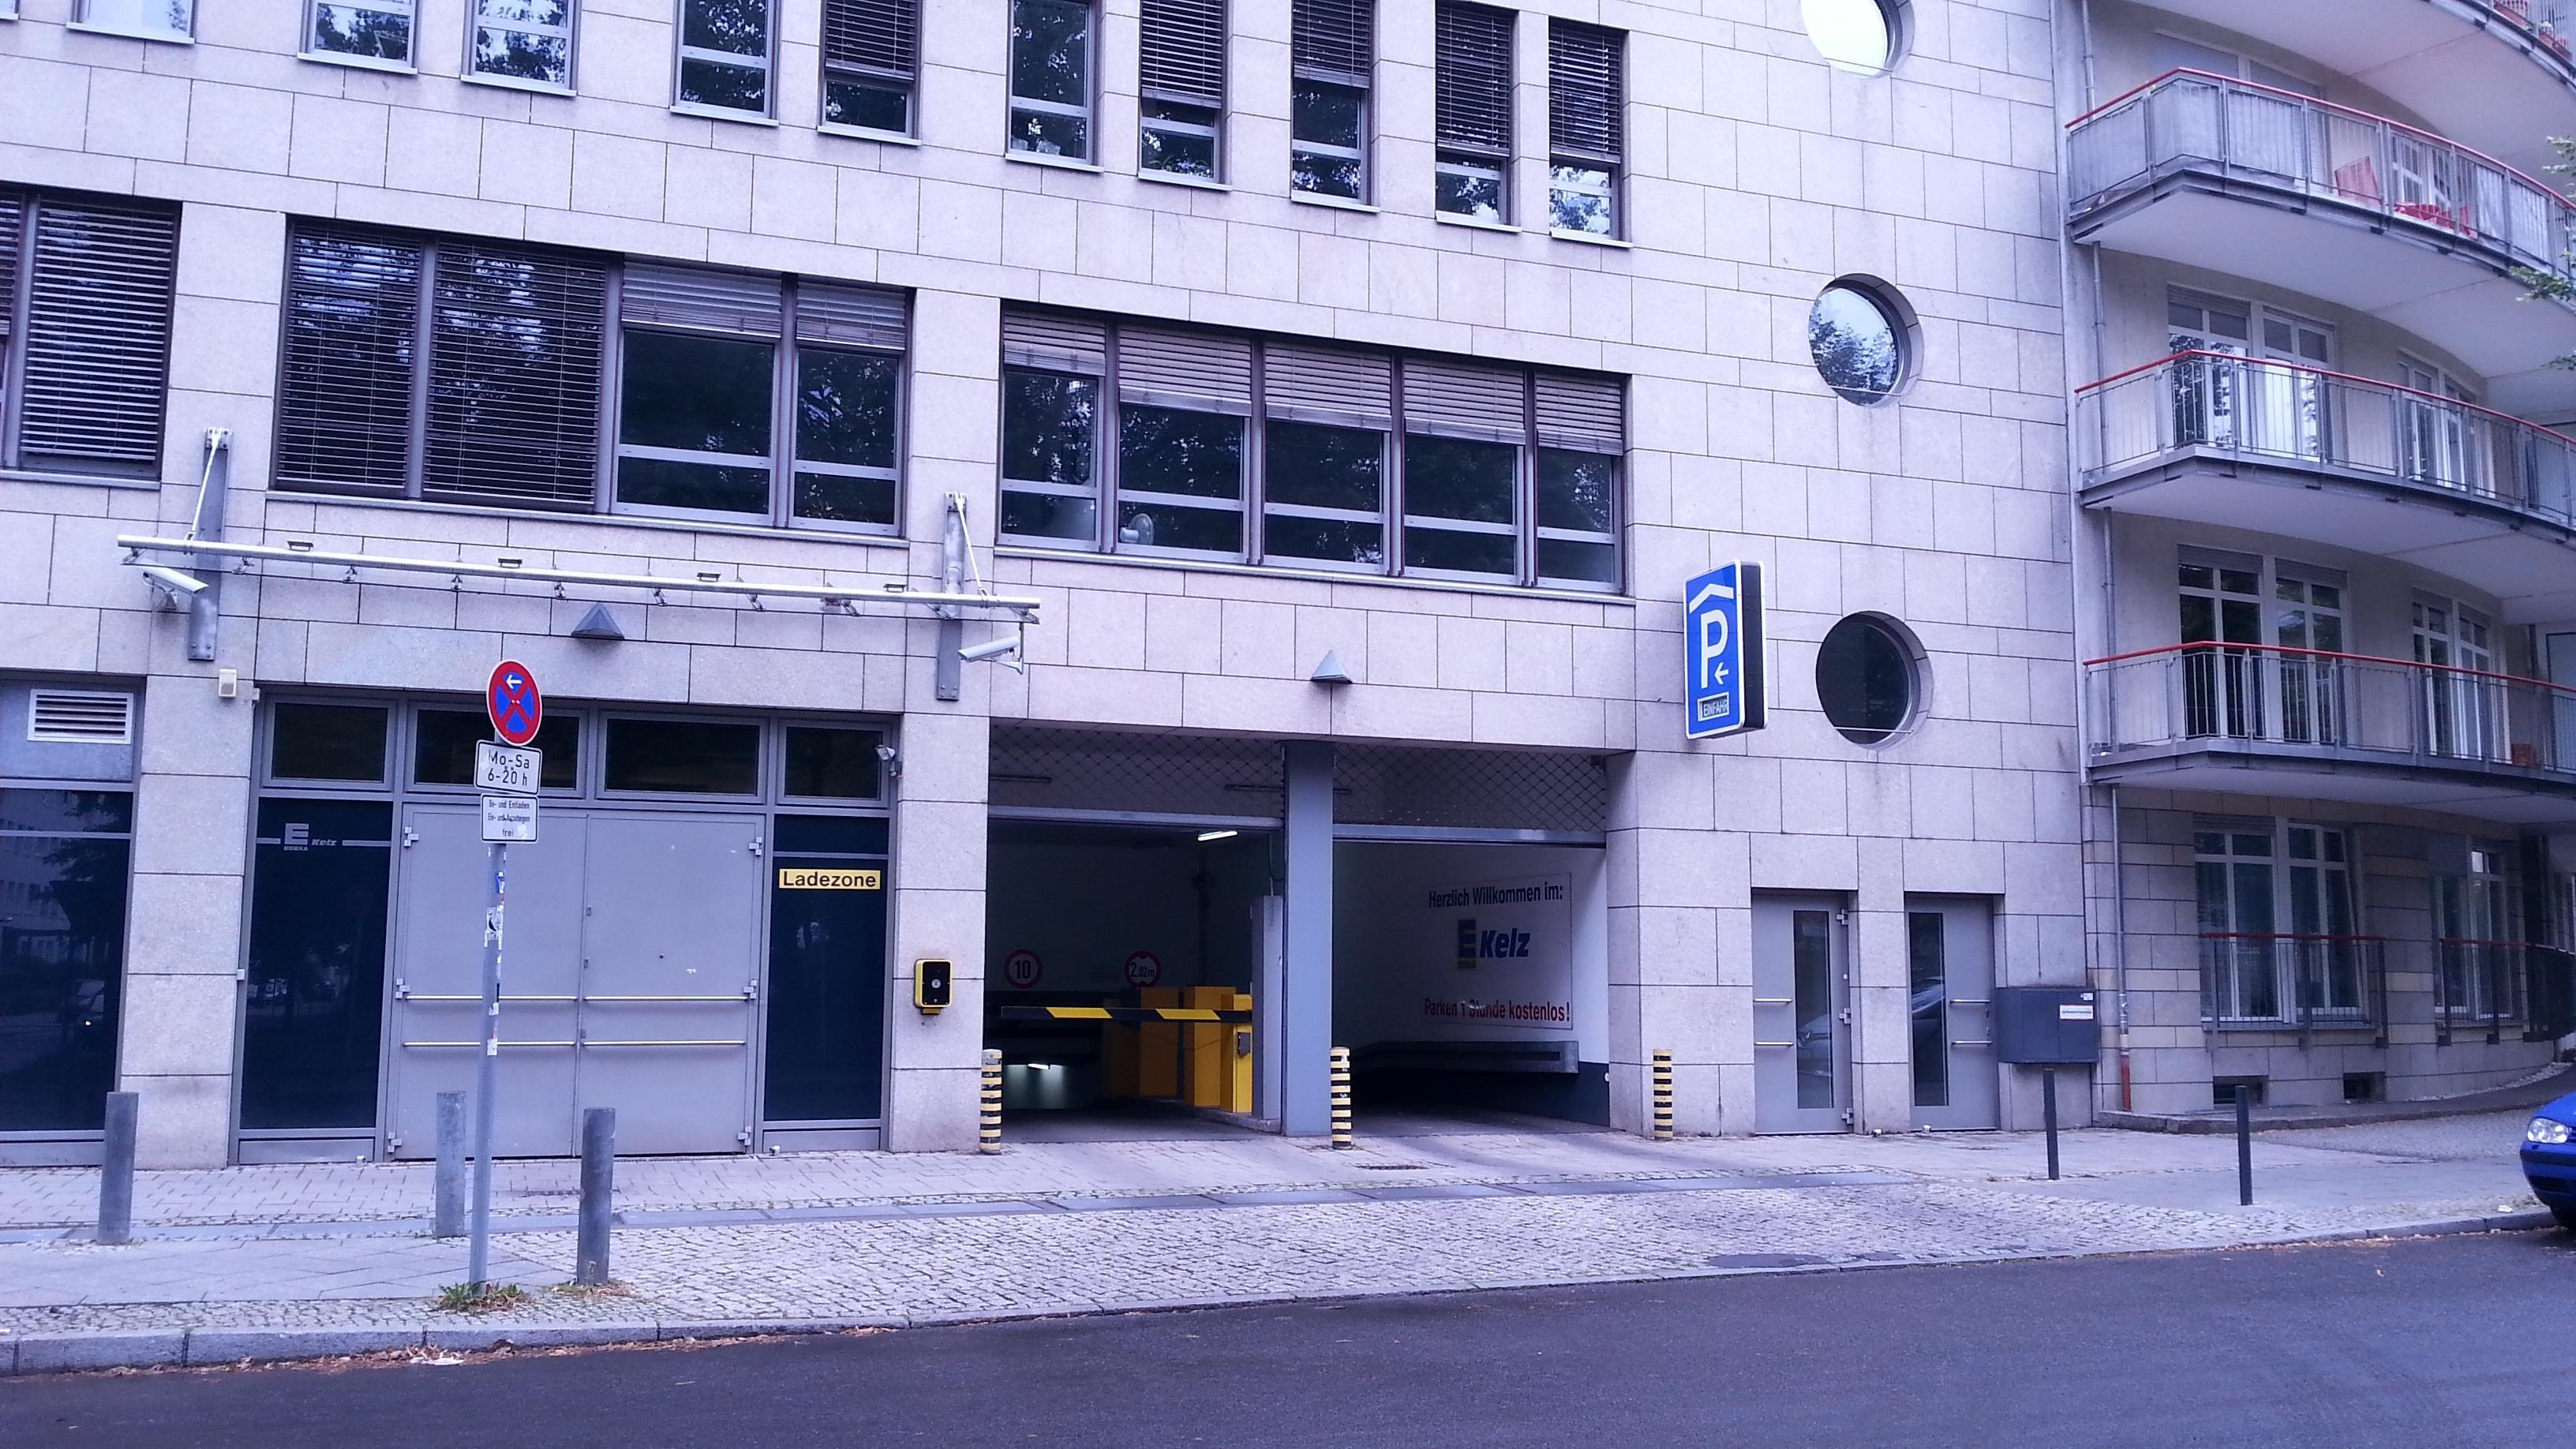 Hildegard jadamowitz stra e 26 garage parking in berlin for Garage ad barlin